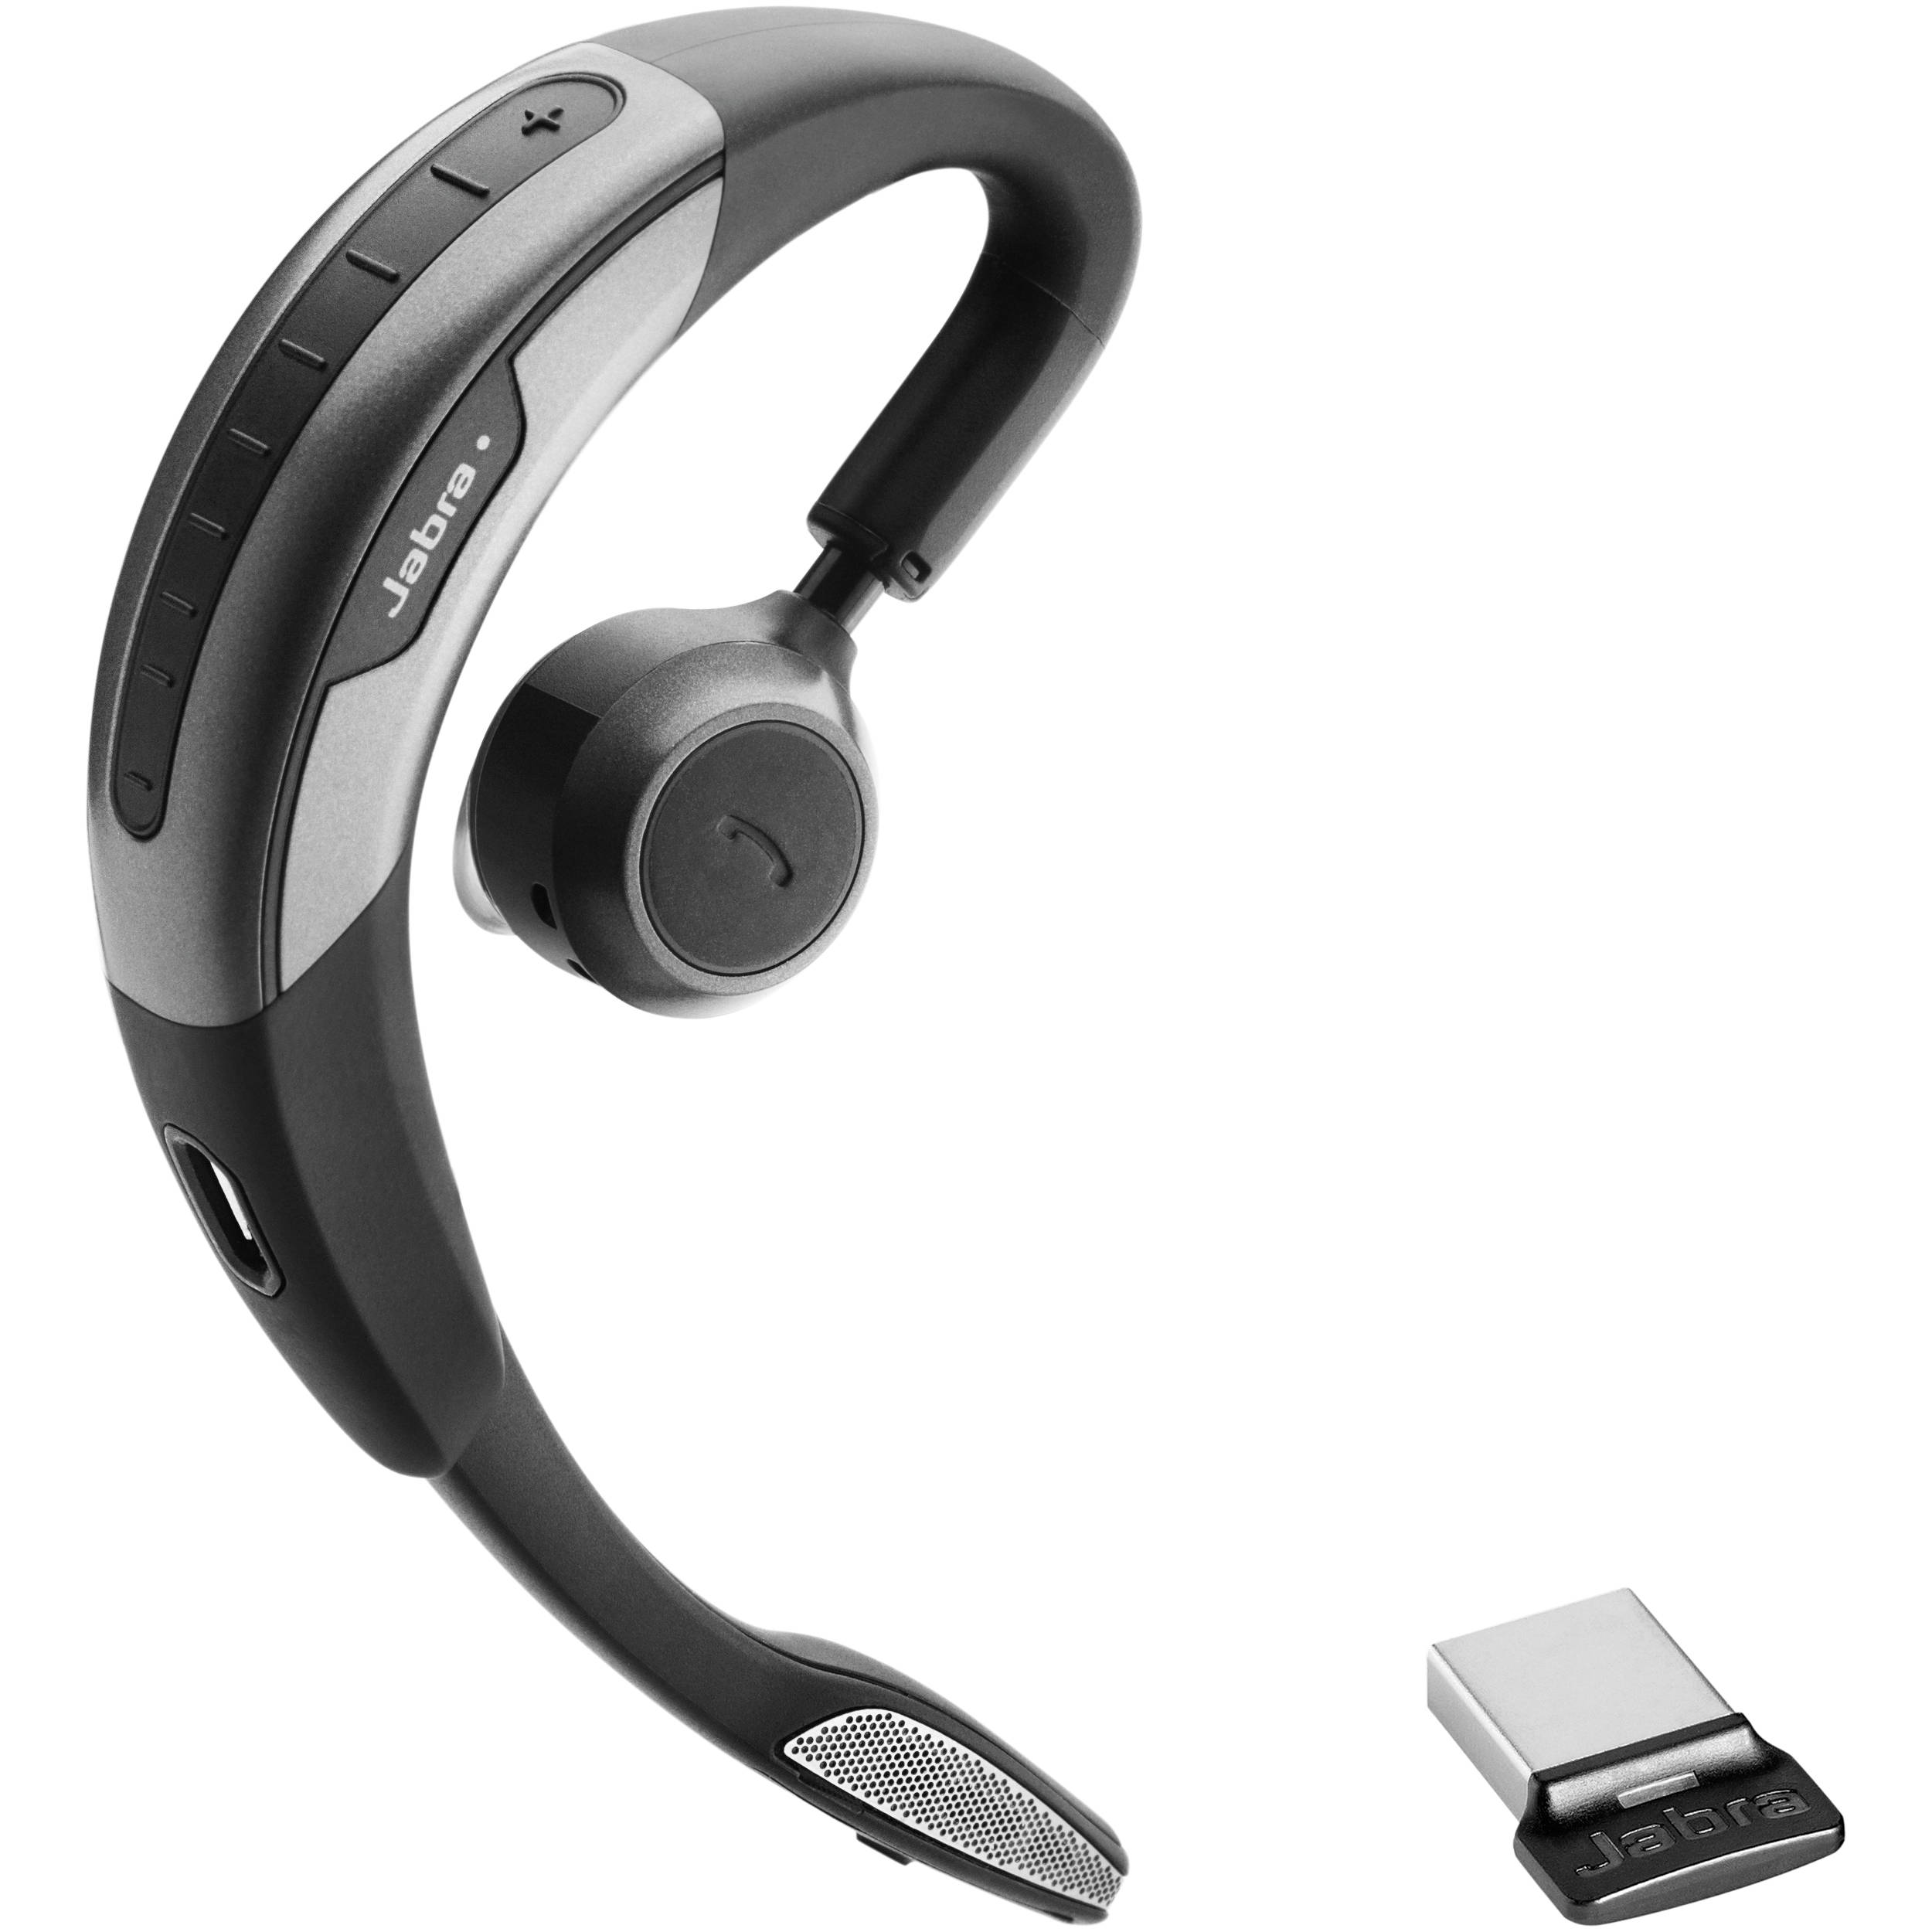 jabra motion uc bluetooth headset 100 99500010 02 b h photo. Black Bedroom Furniture Sets. Home Design Ideas